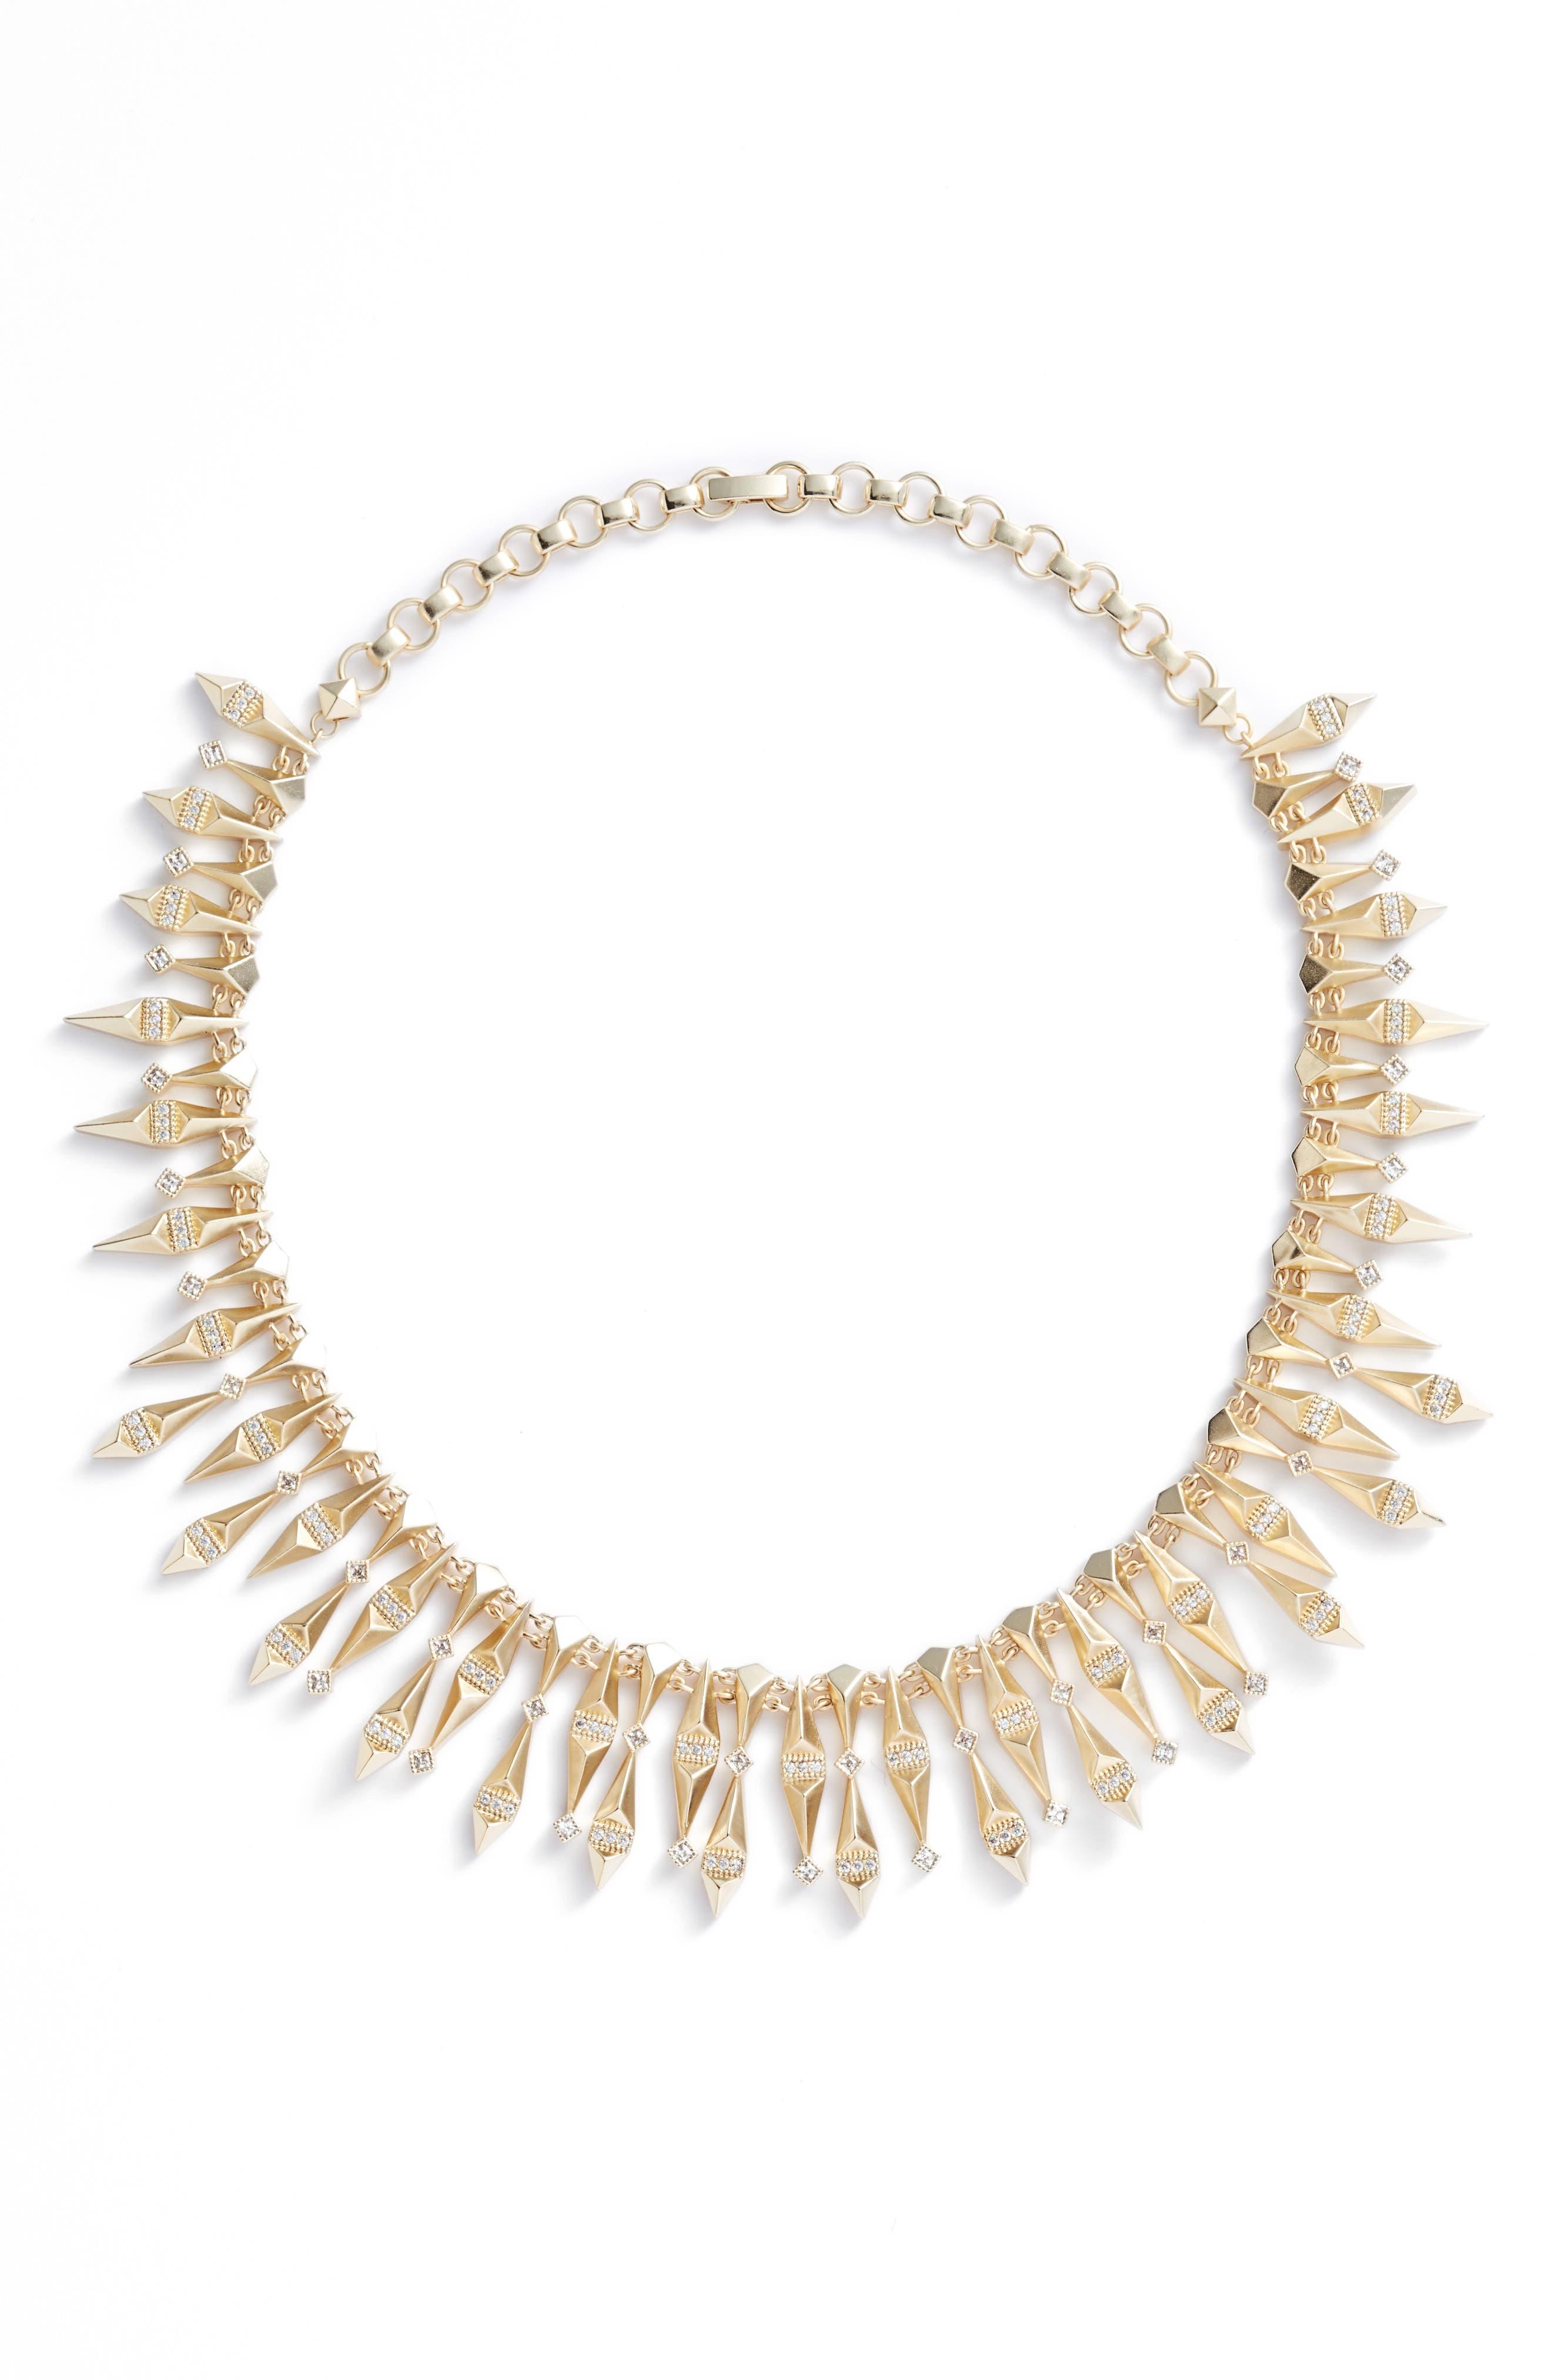 Alternate Image 1 Selected - Kendra Scott Cici Collar Necklace